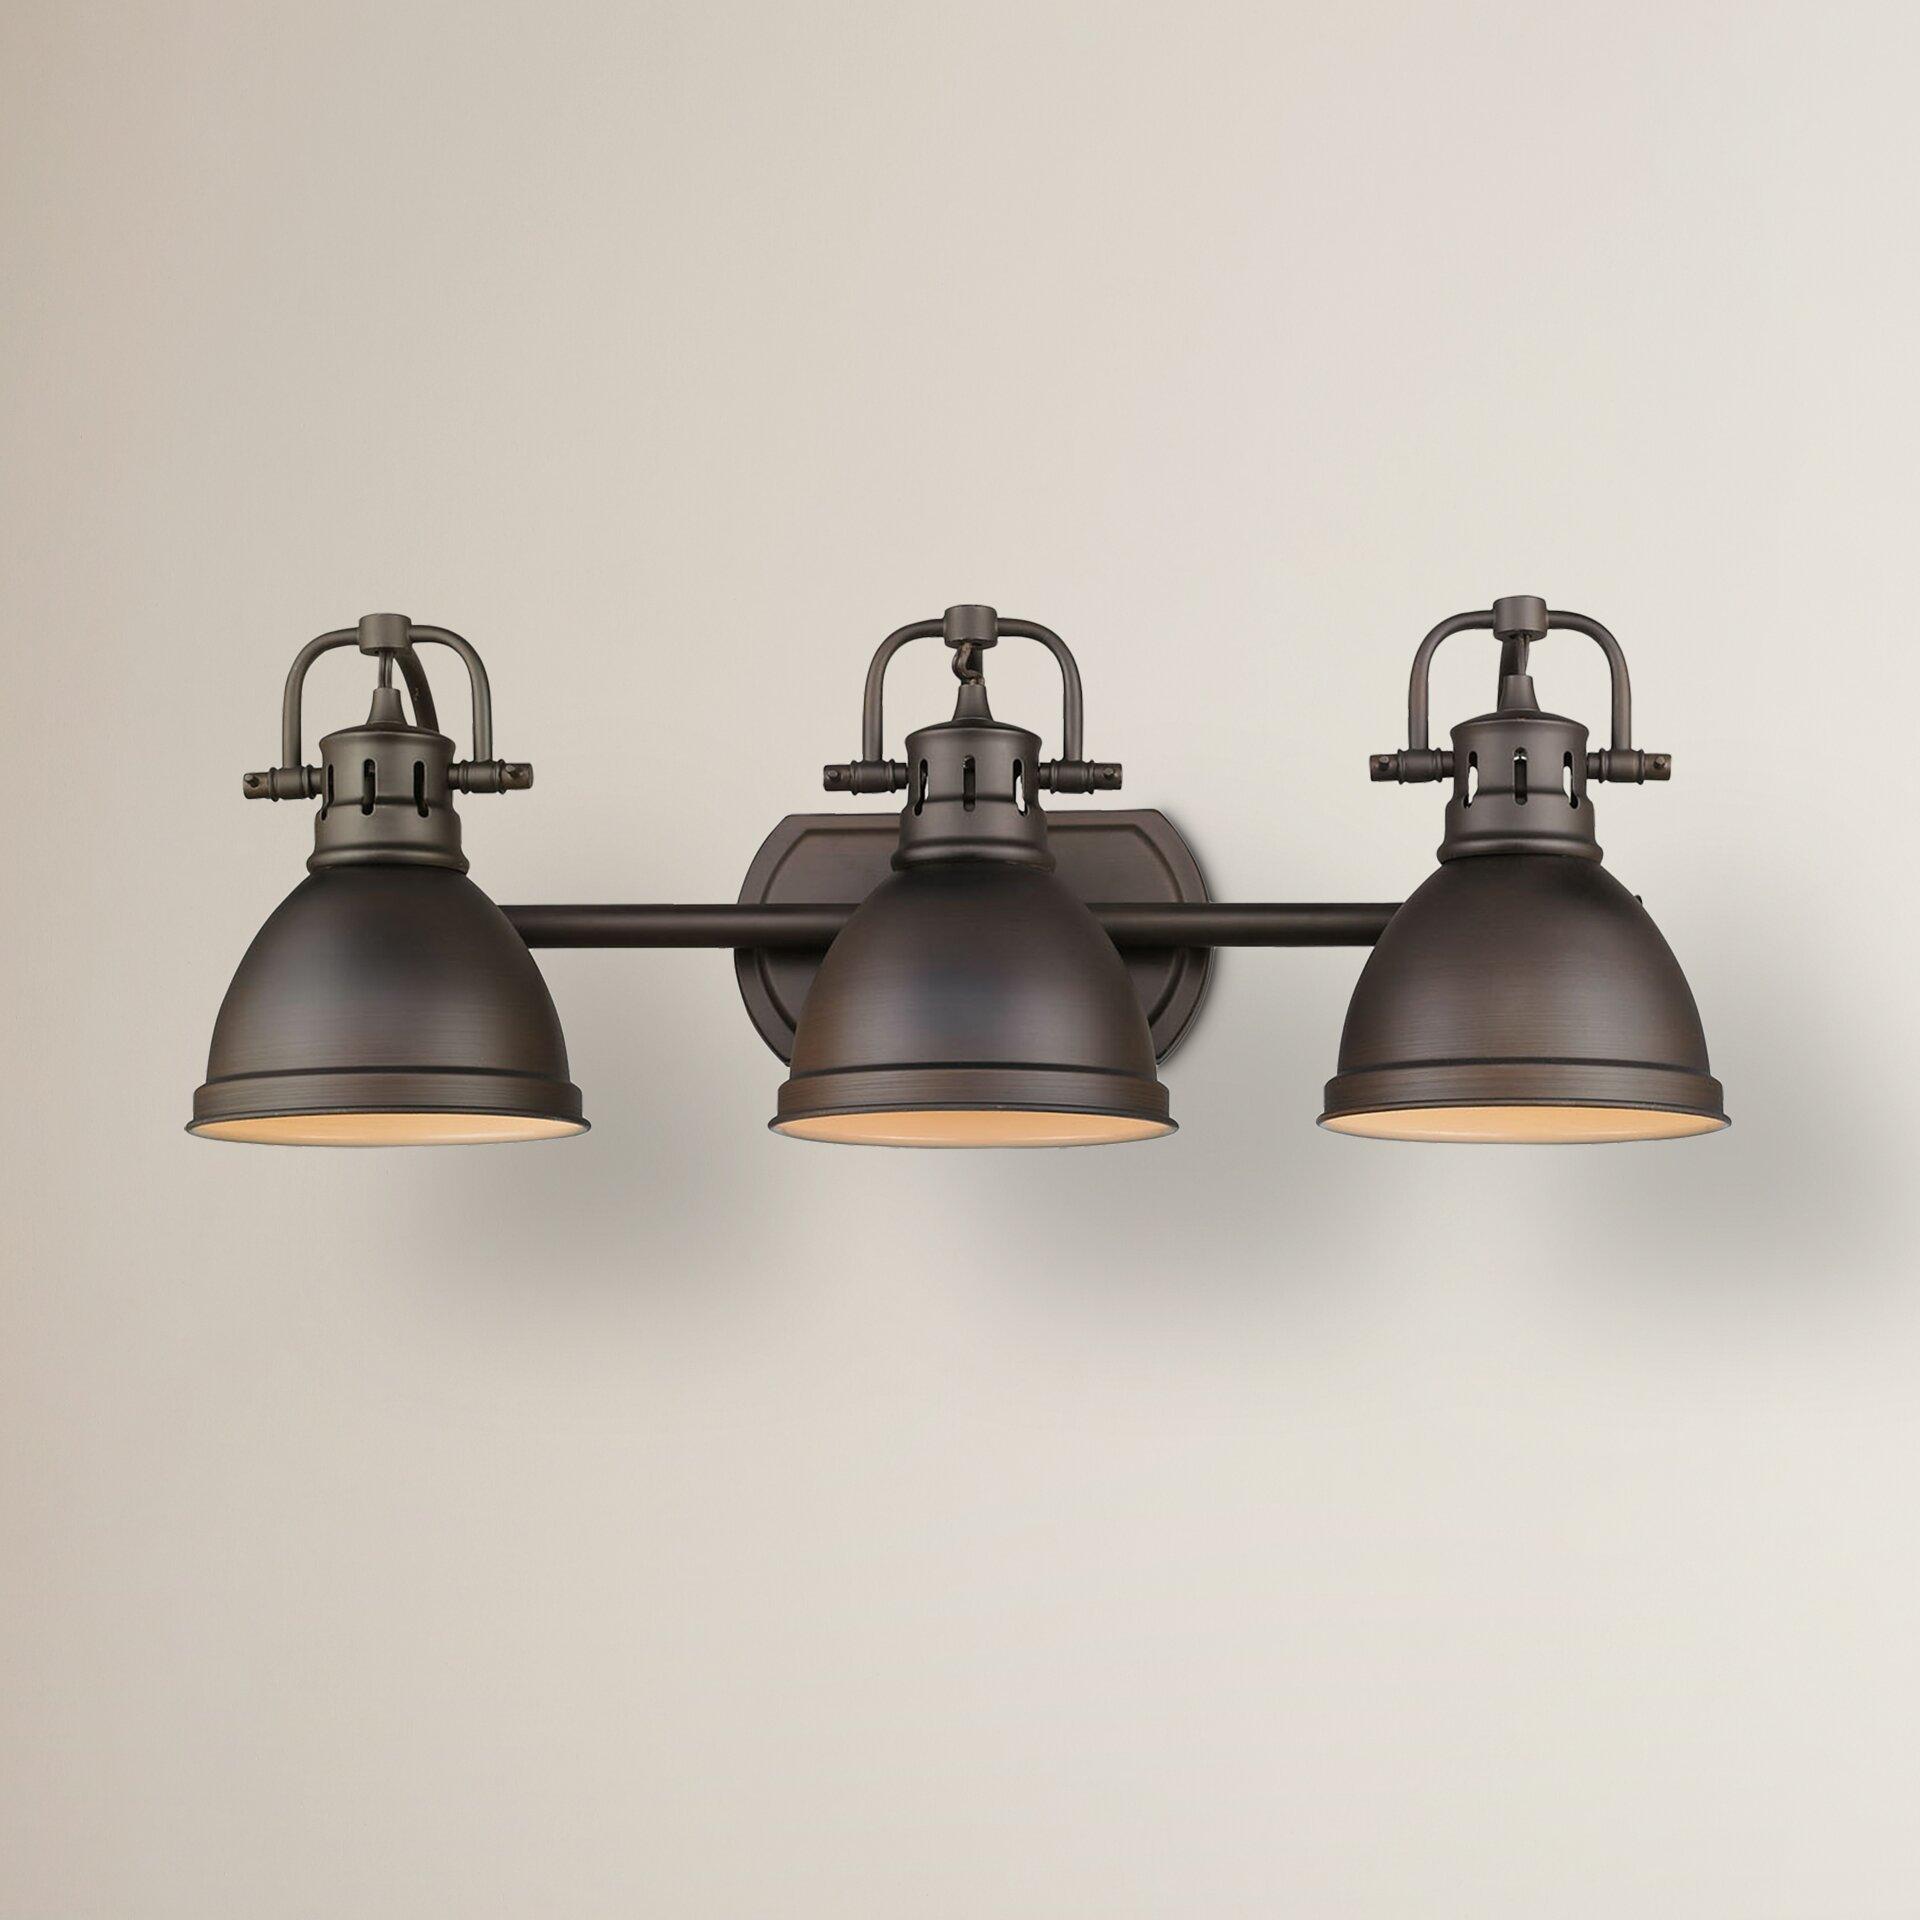 Beachcrest Home Gotha 3 Light Vanity Light Reviews: Beachcrest Home Bodalla 3-Light Vanity Light & Reviews